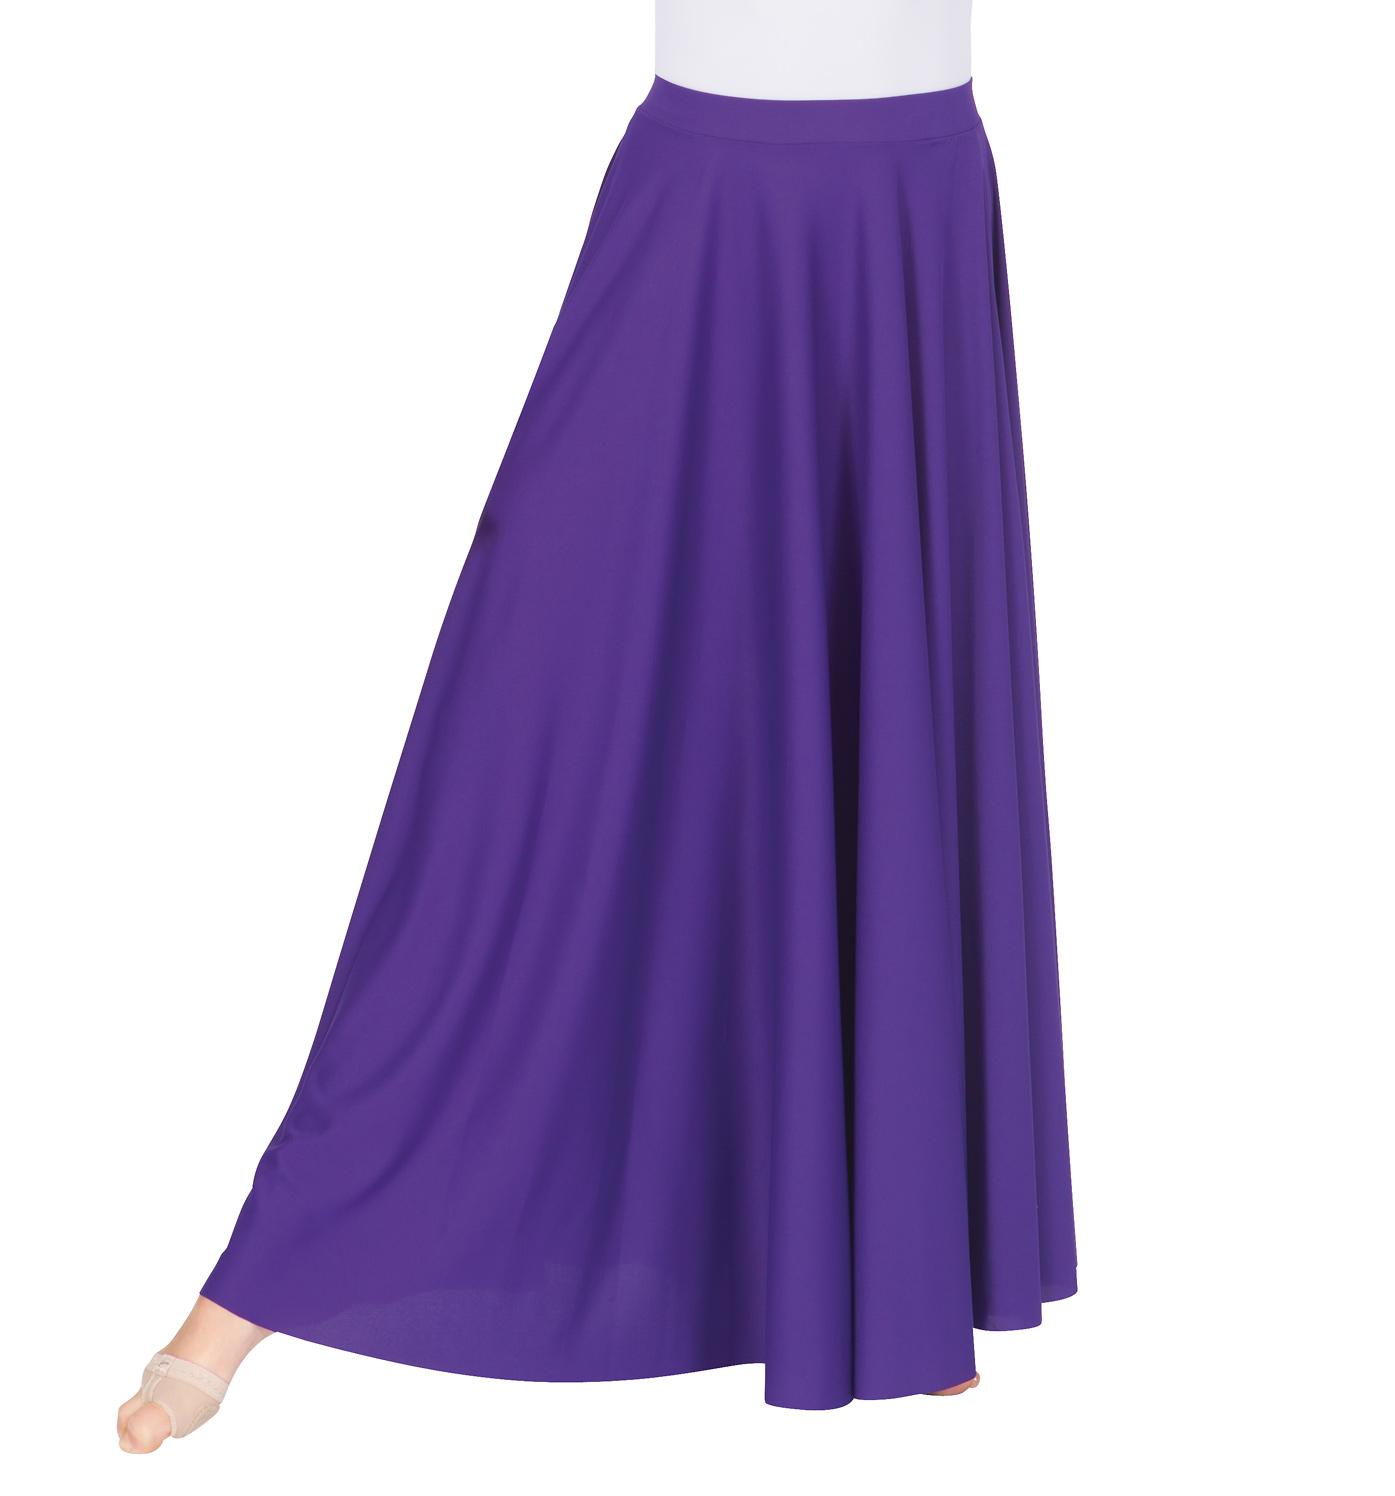 Dance Circle Skirt 44